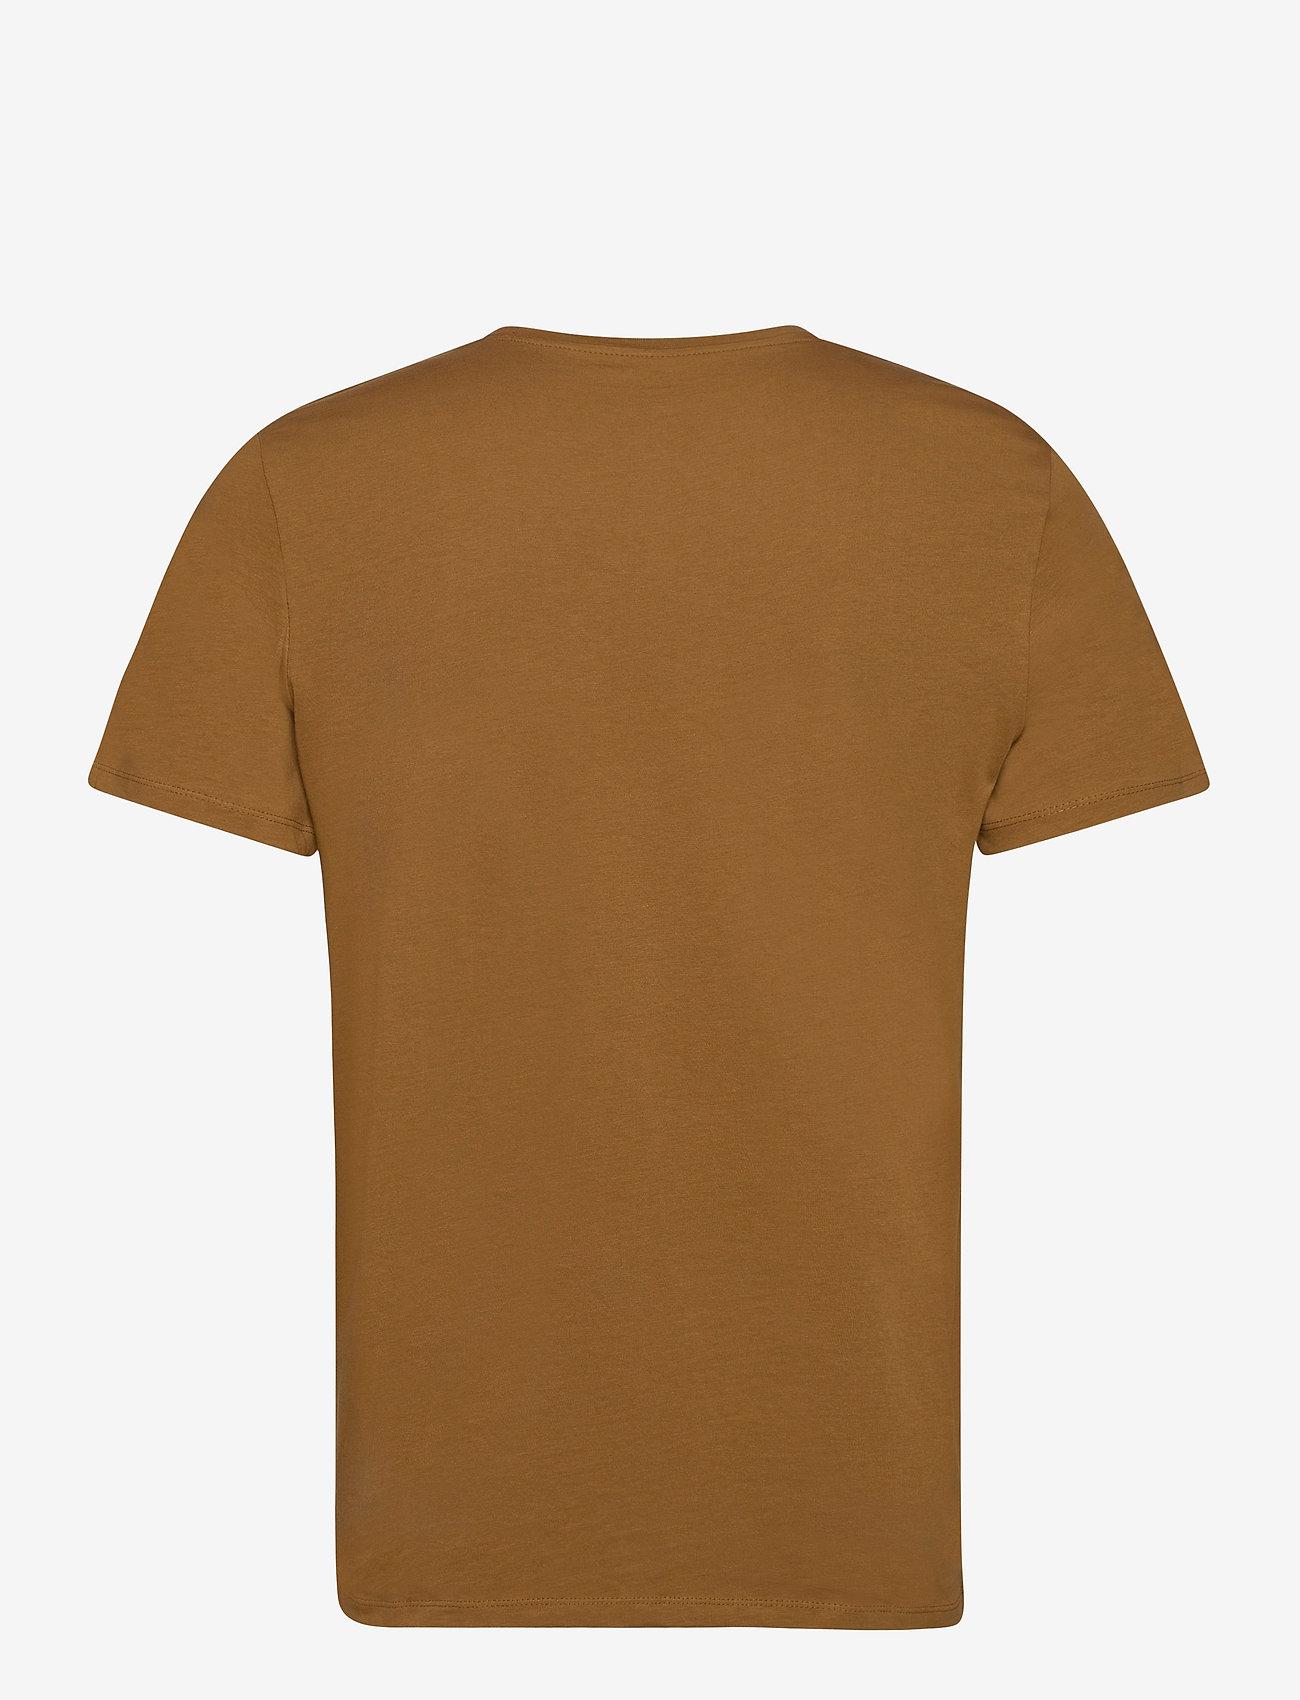 Jack & Jones - JOROLIVER TEE SS CREW NECK - kortärmade t-shirts - rubber - 1